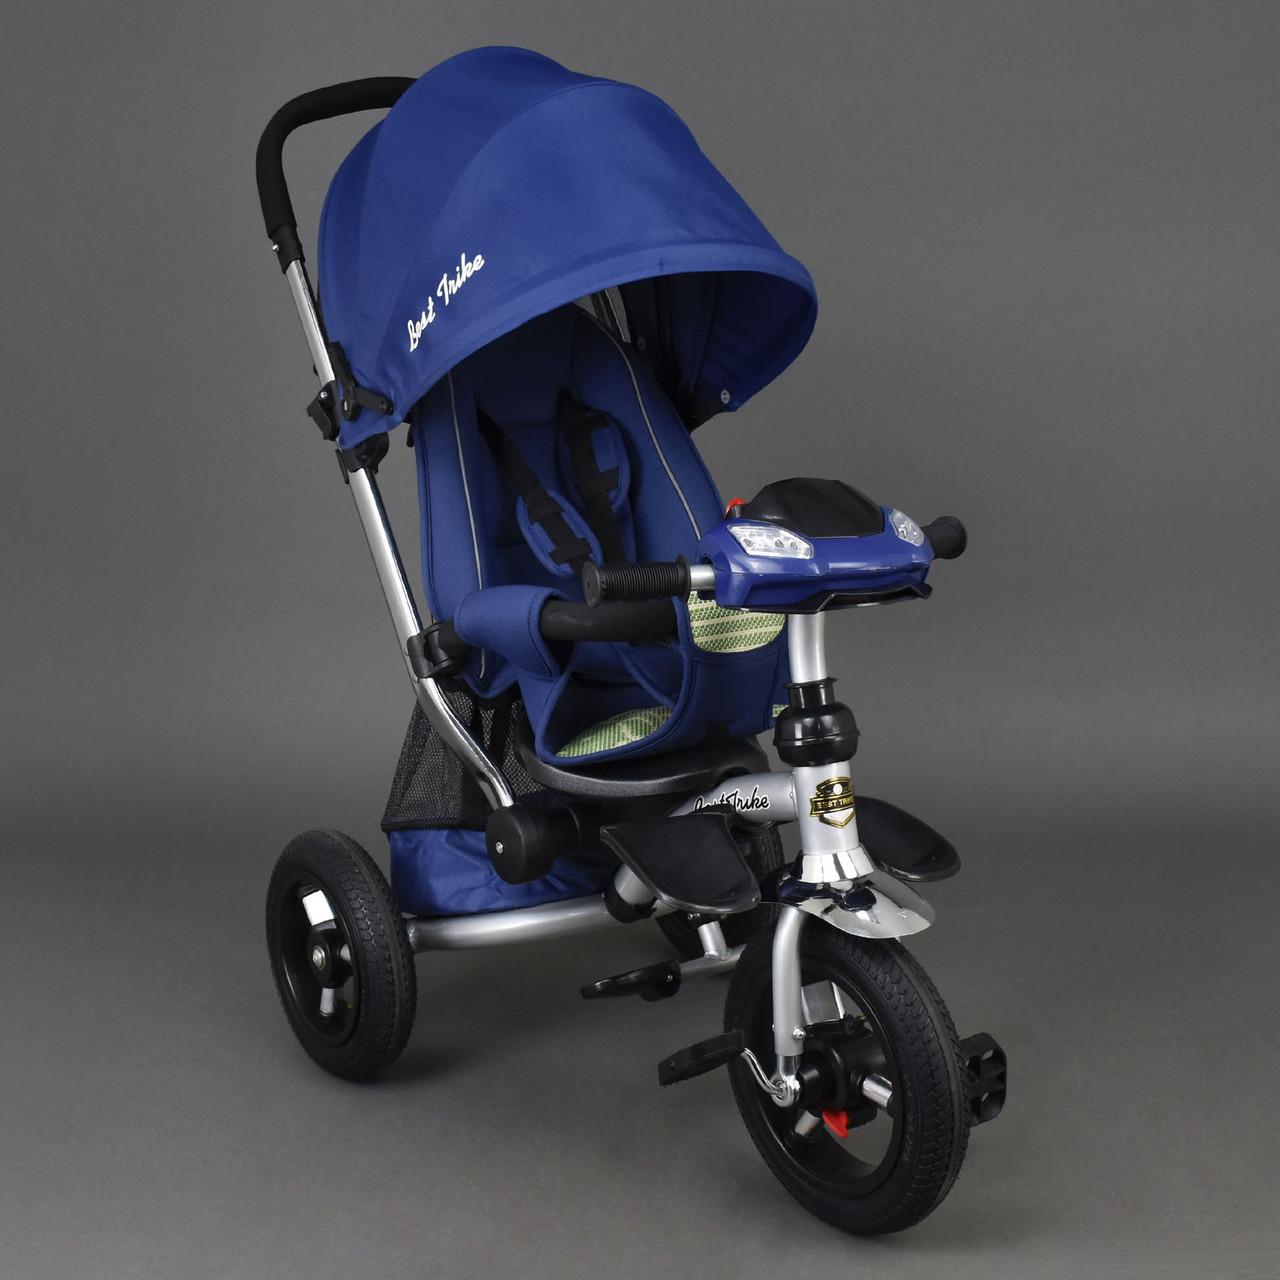 Велосипед-коляска Best Trike 698 с опускающейся спинкой (синий)